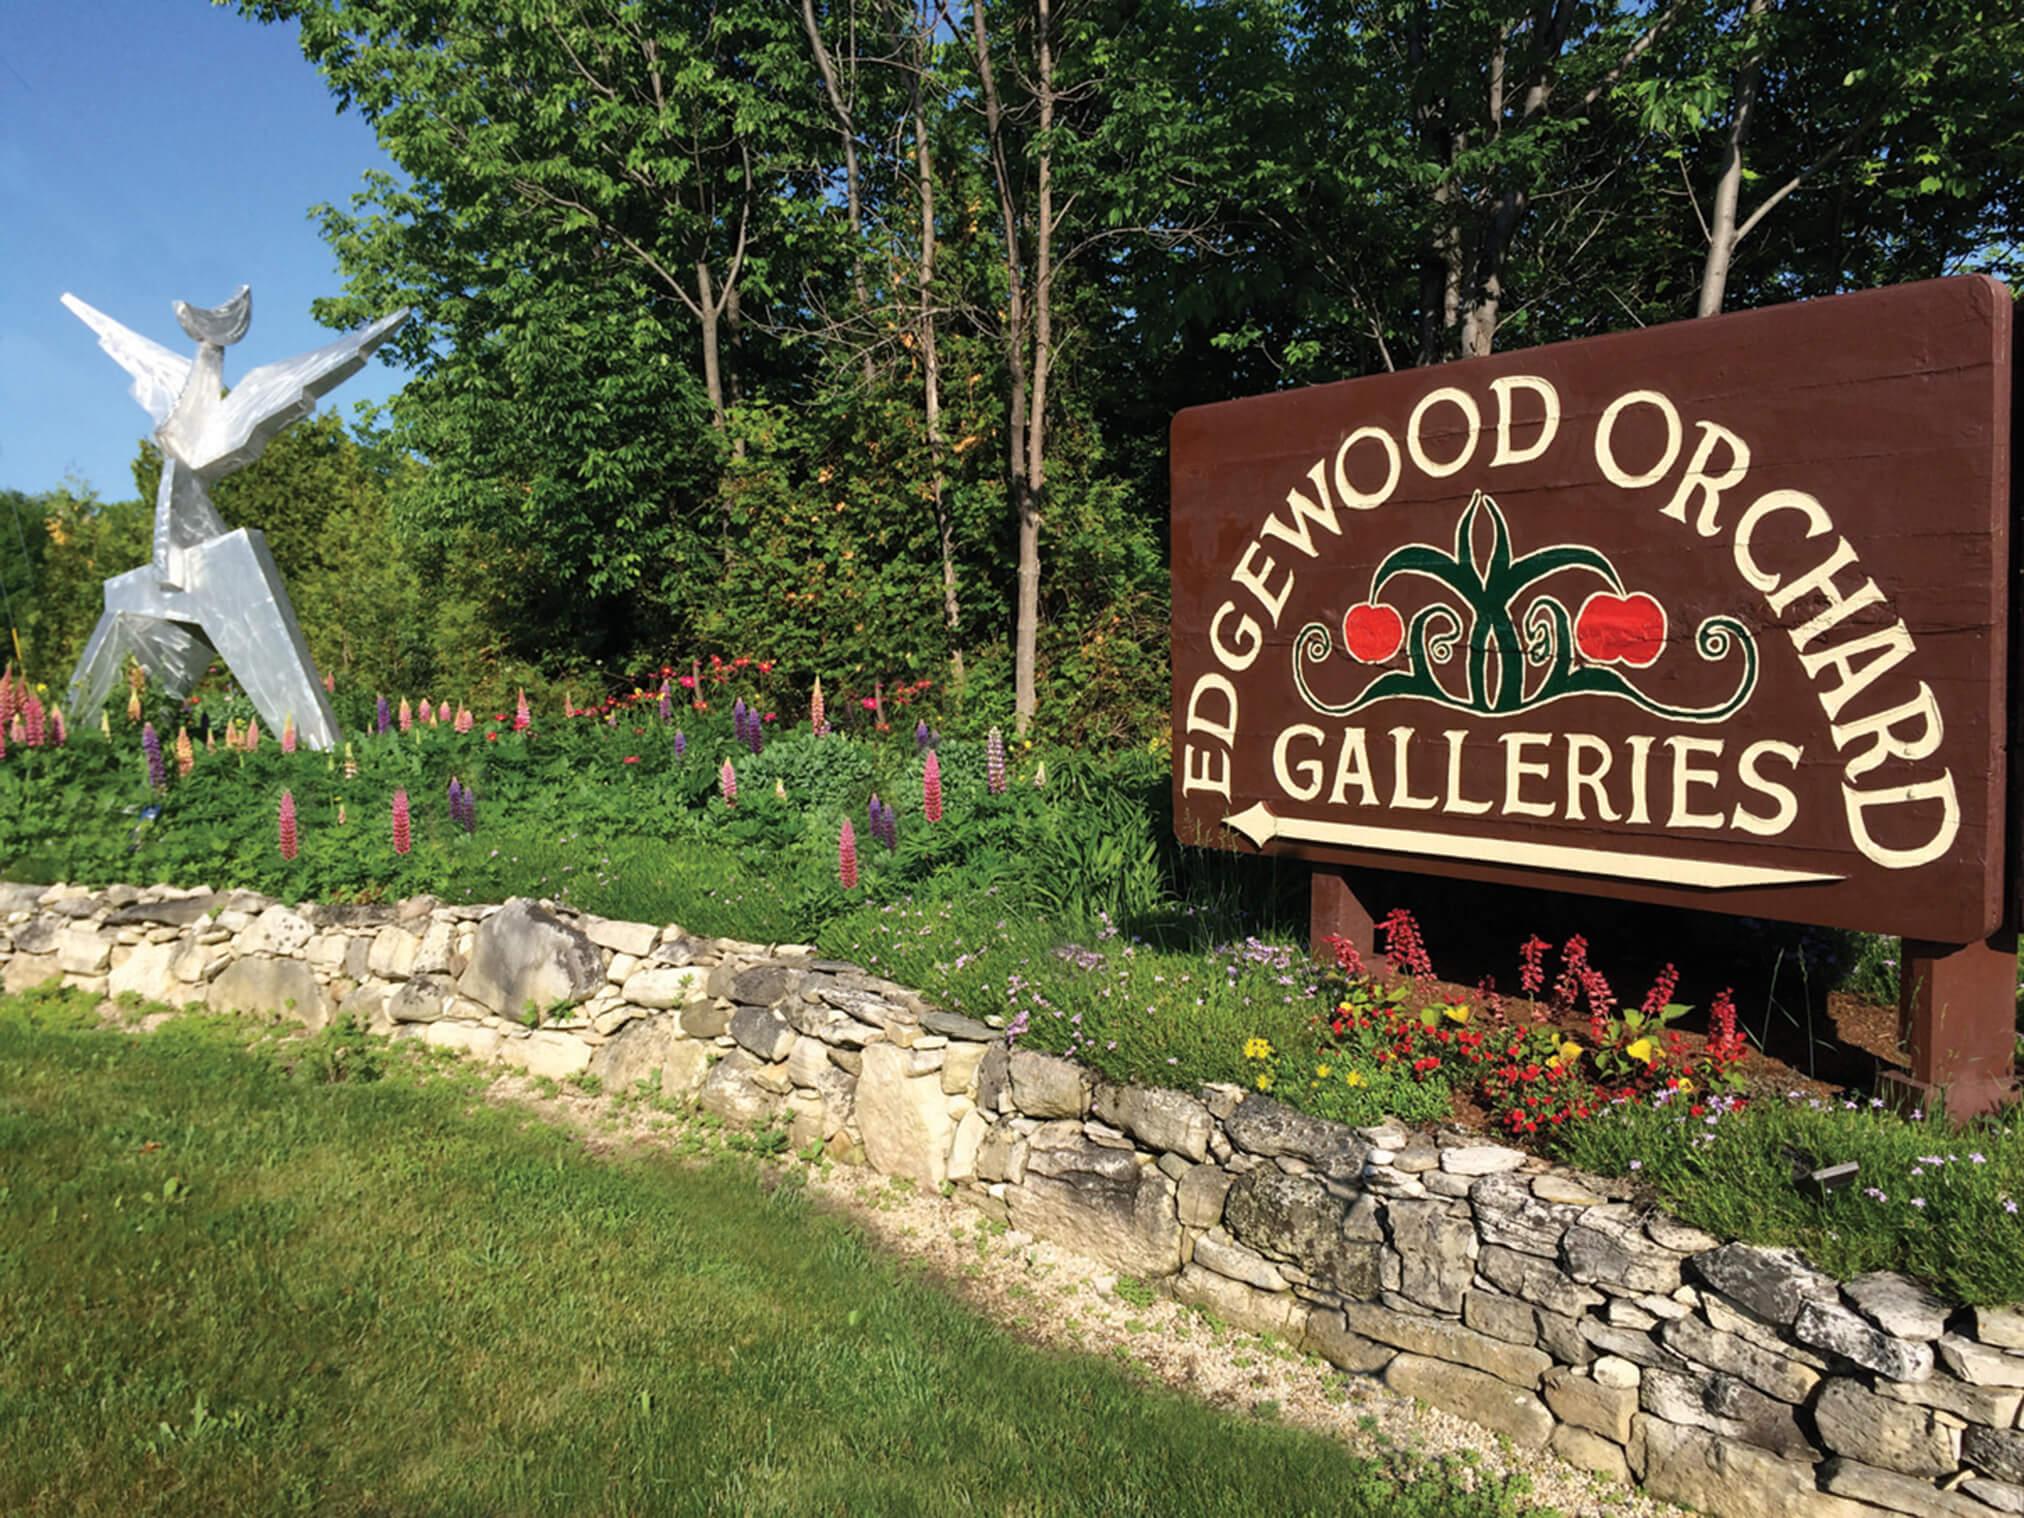 Edgewood Orchard Galleries